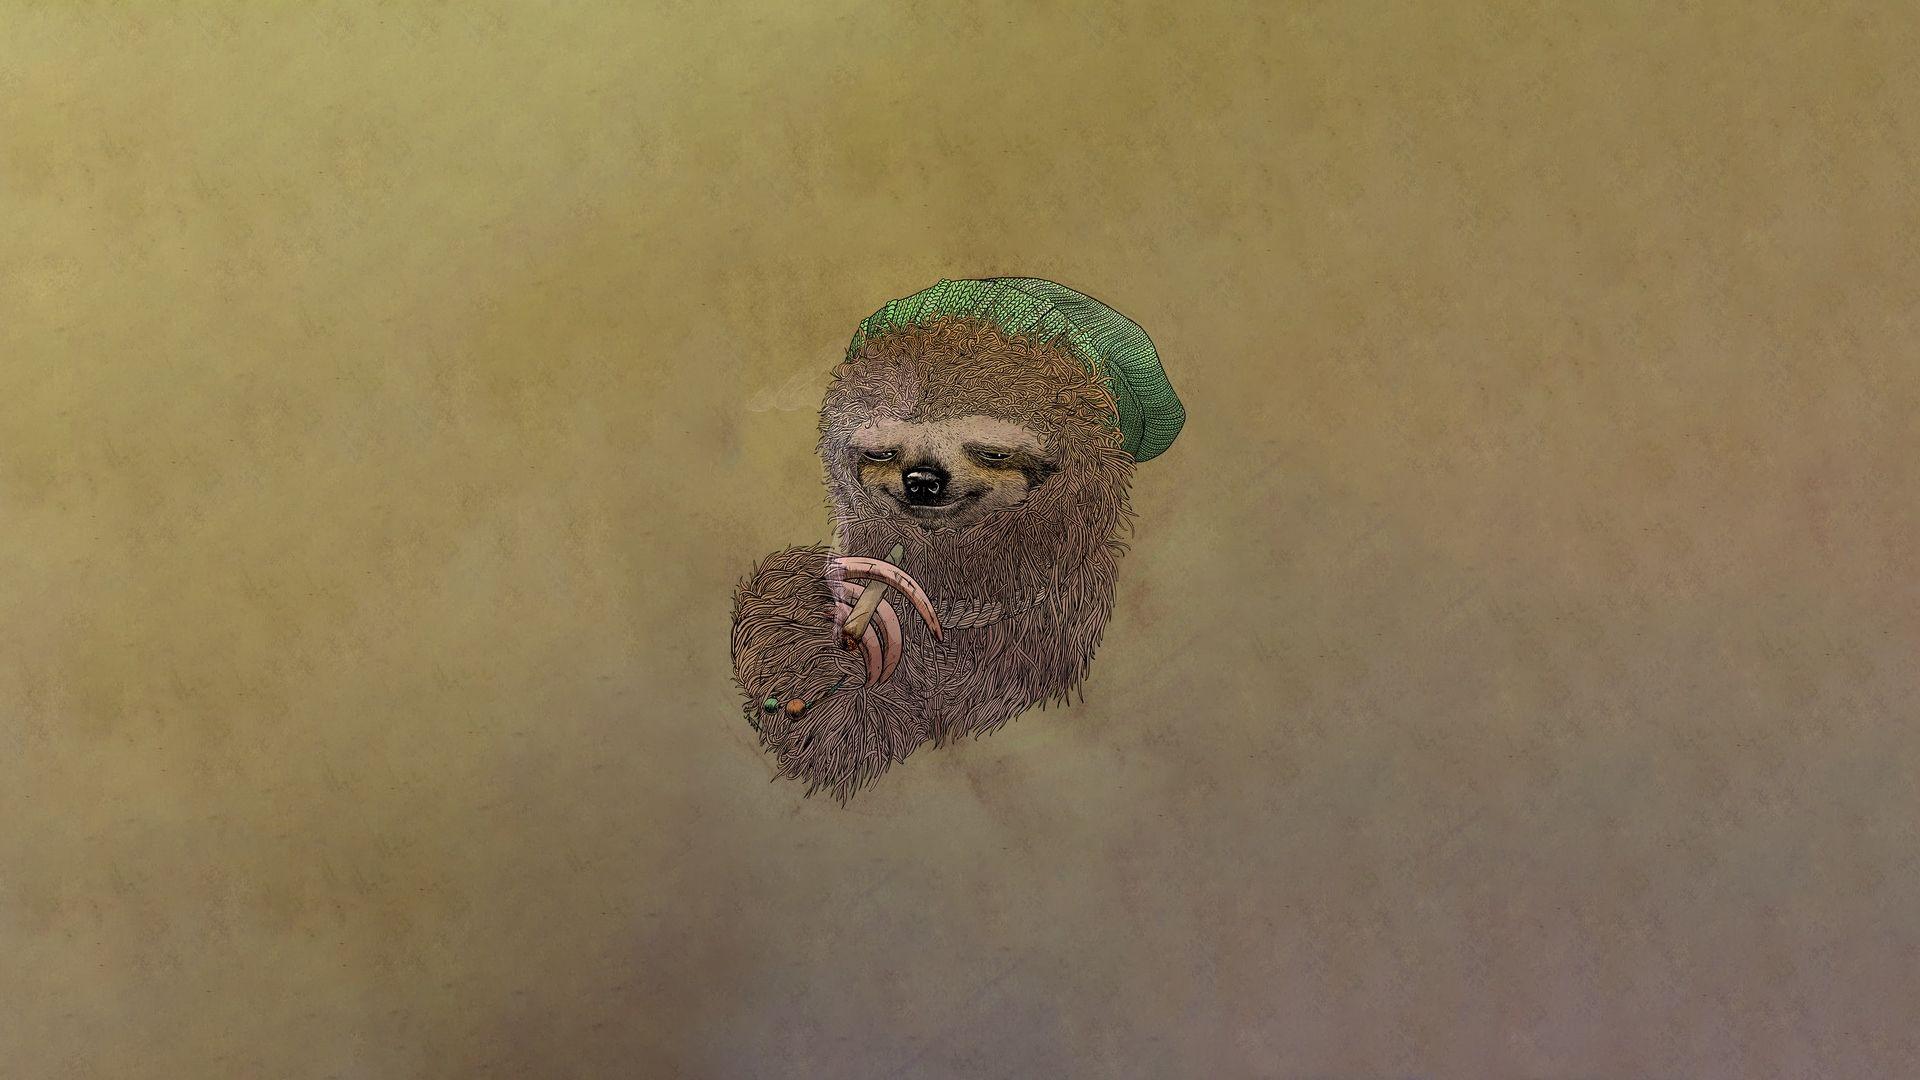 Sloth HD 1080 wallpaper